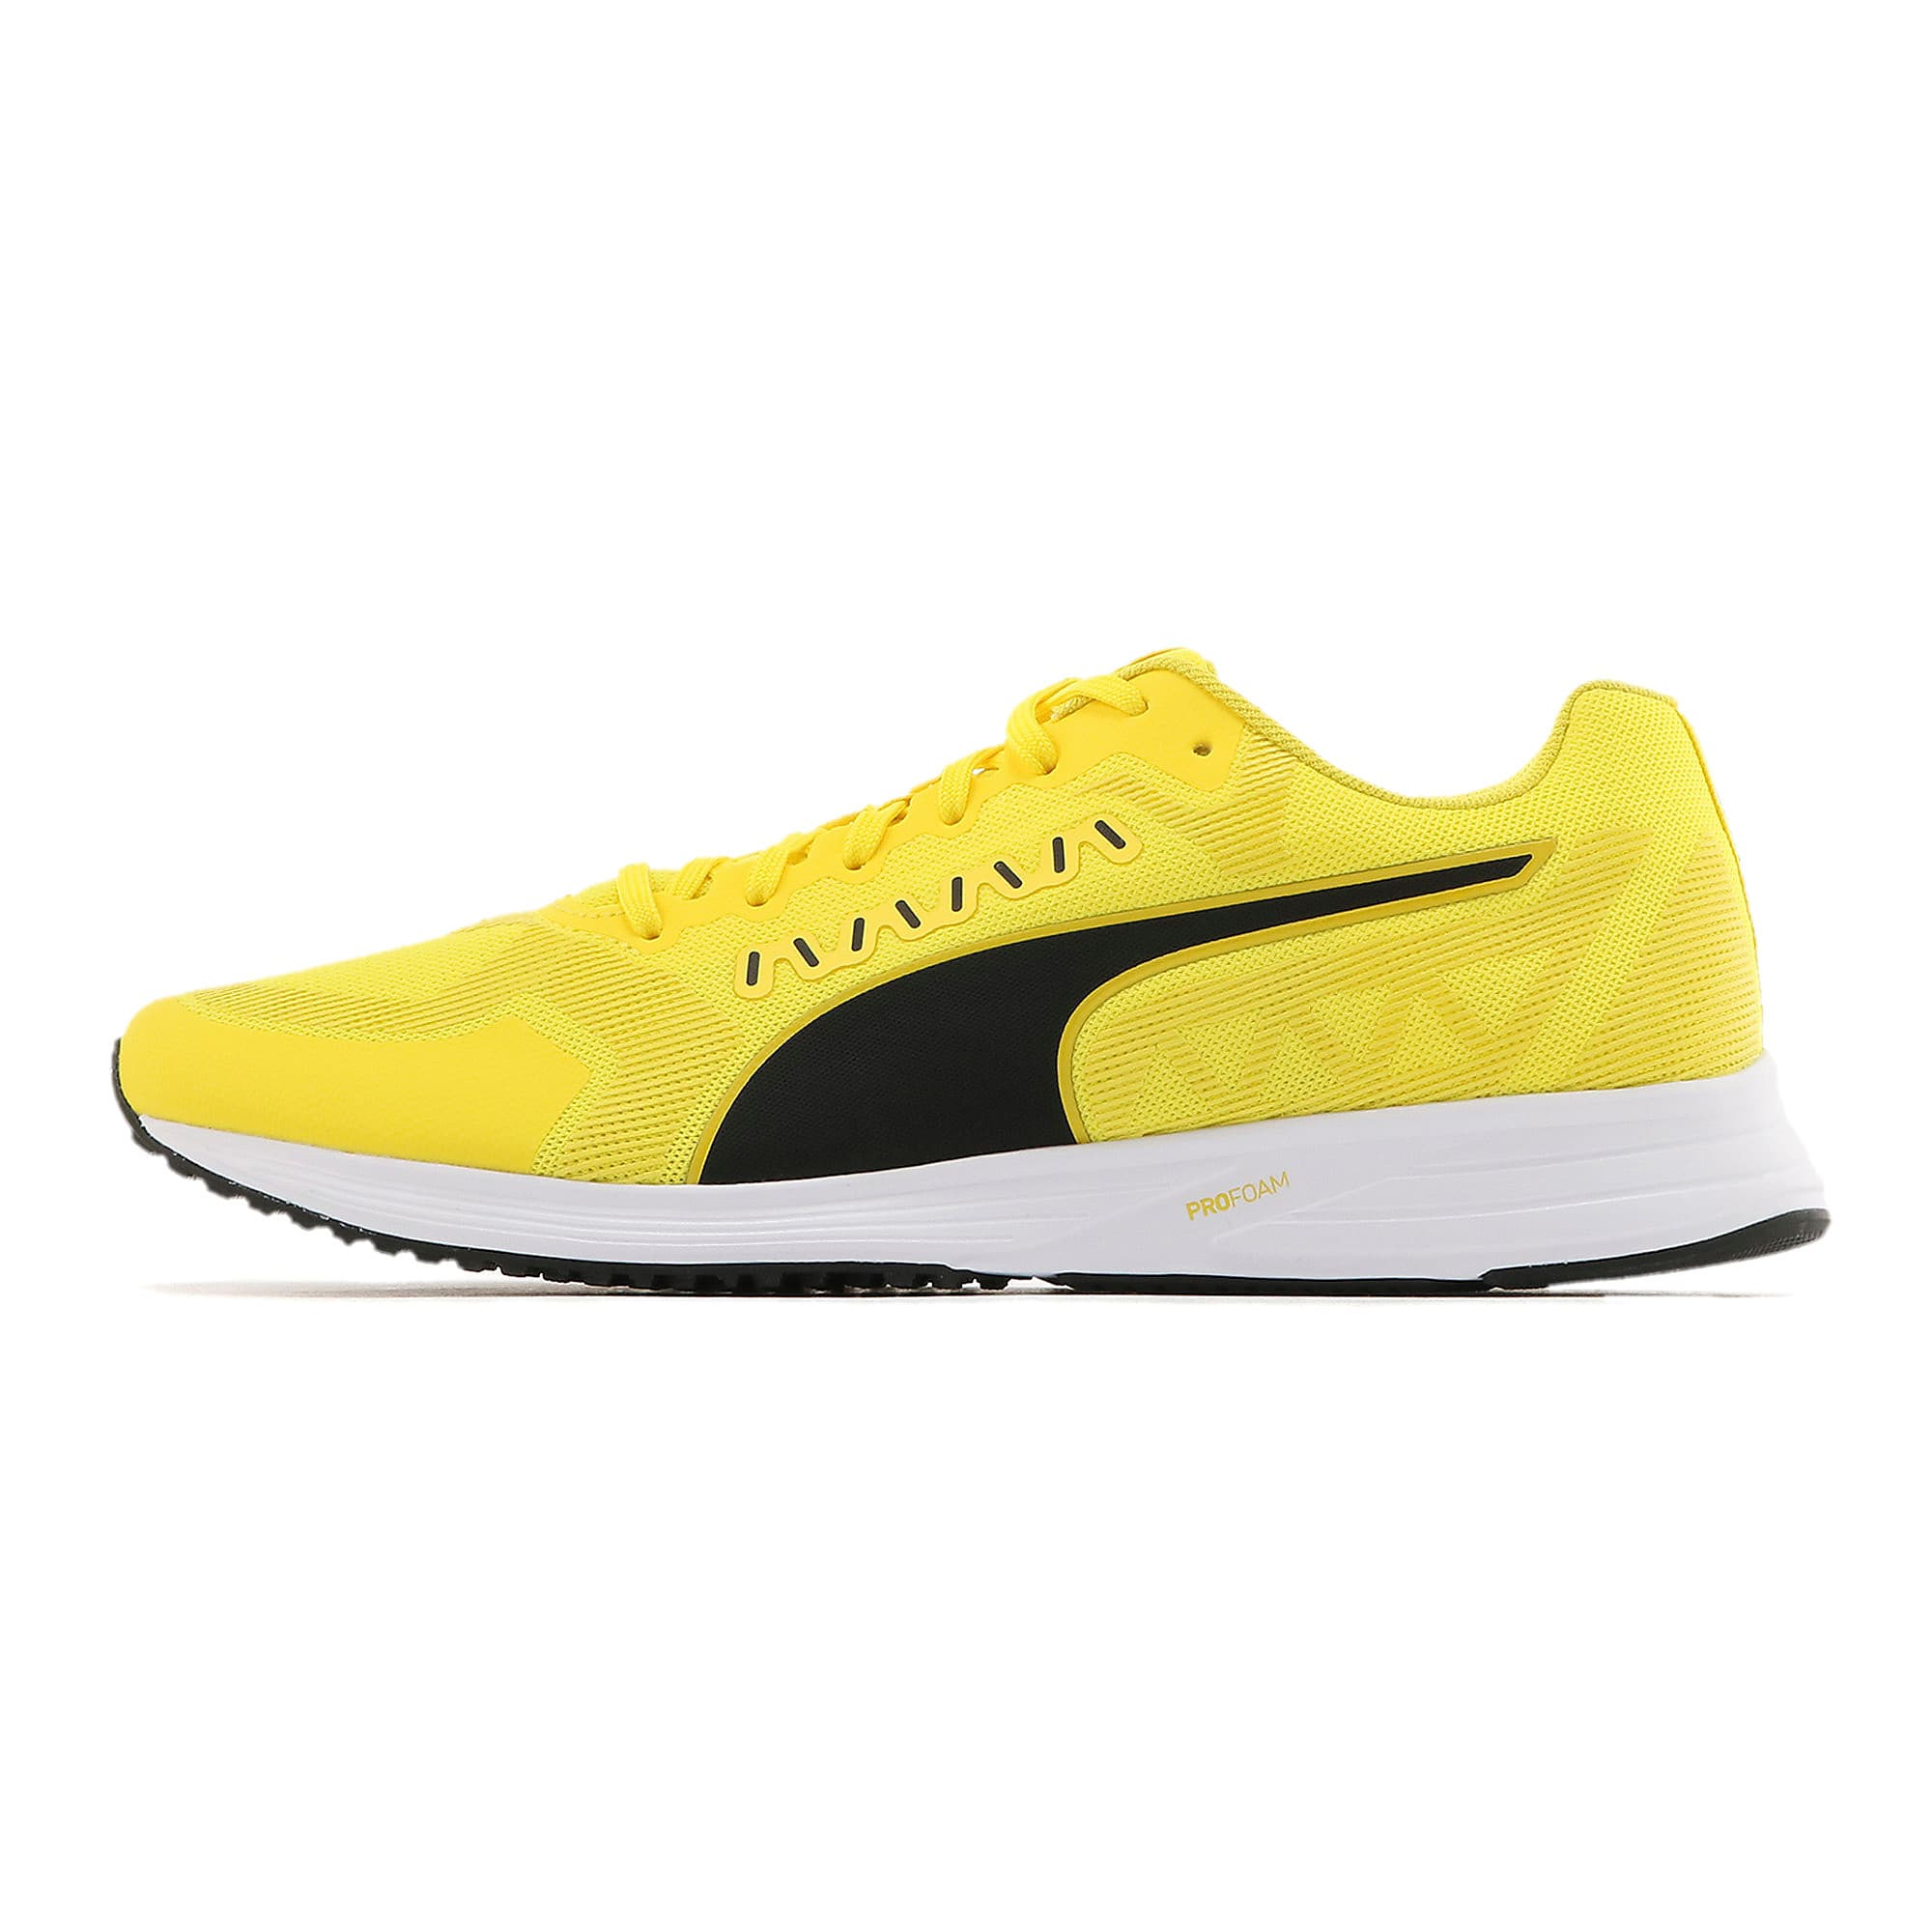 Thumbnail 1 of スピード ライト 2 ランニング, Blazing Yellow-Puma Black, medium-JPN